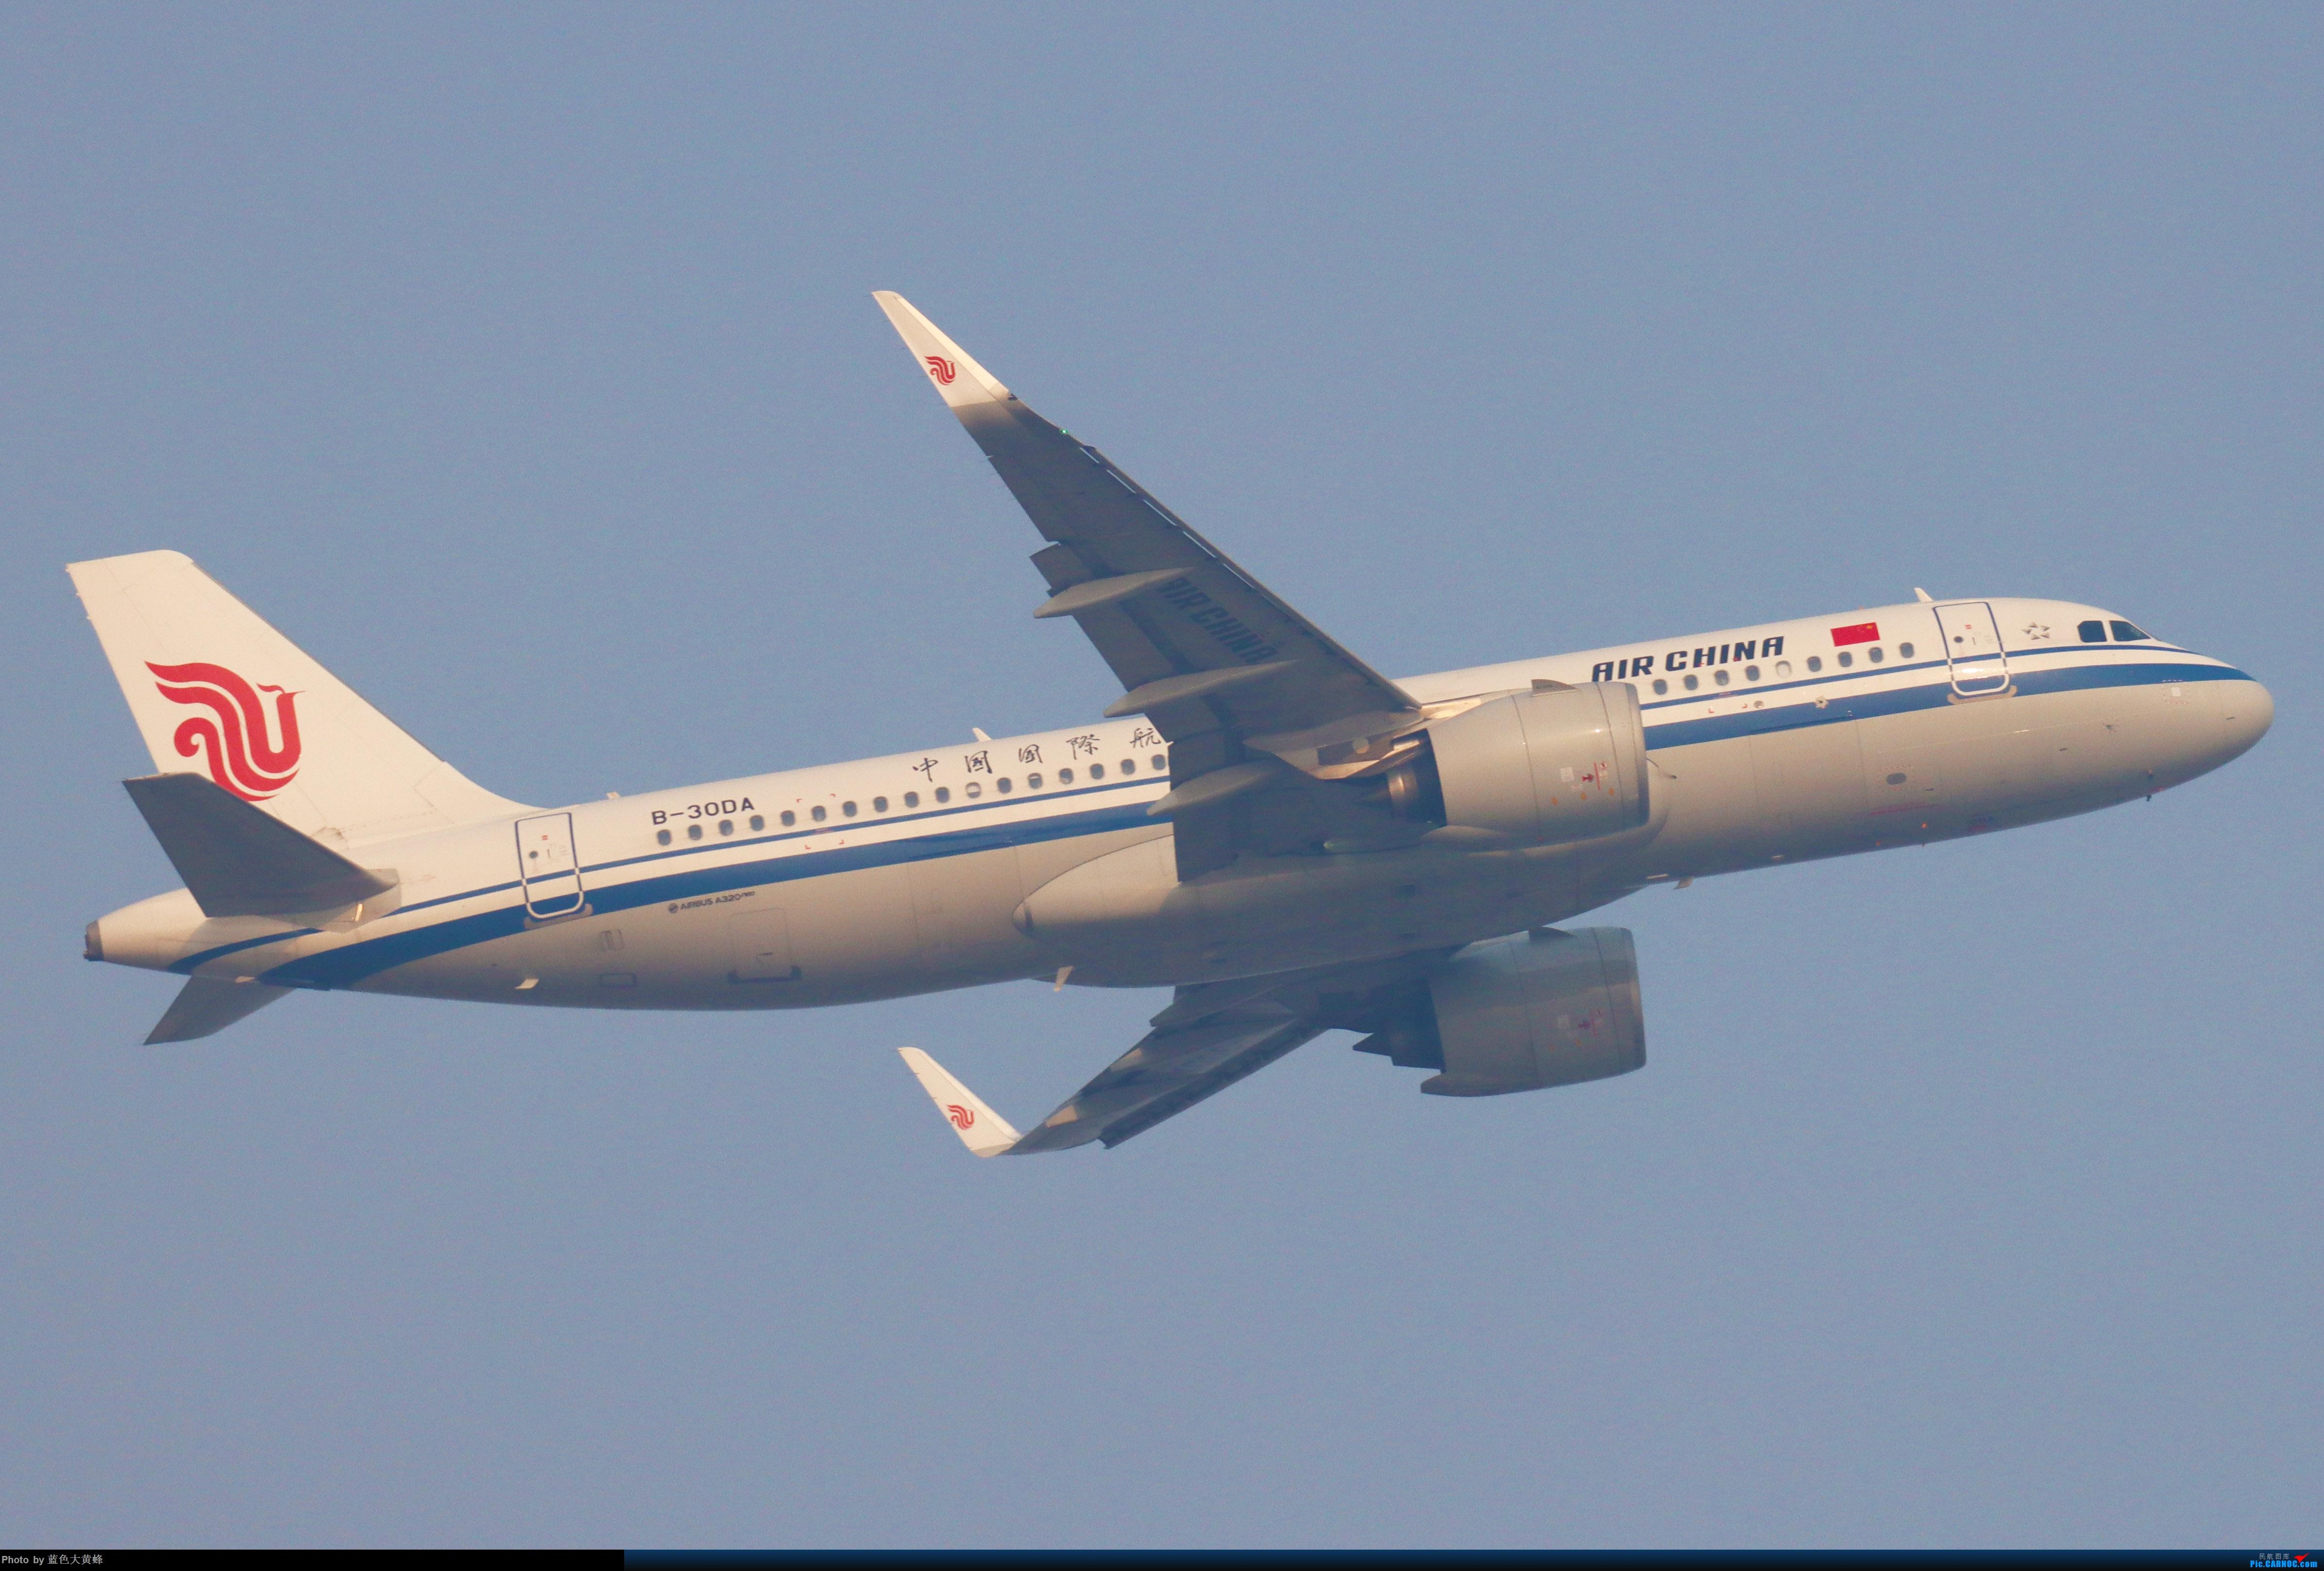 Re:[原创]2020.5.30PEK拍机,偶遇联邦的MD11给18R降落,实属罕见 AIRBUS A320NEO B-30DA 中国北京首都国际机场